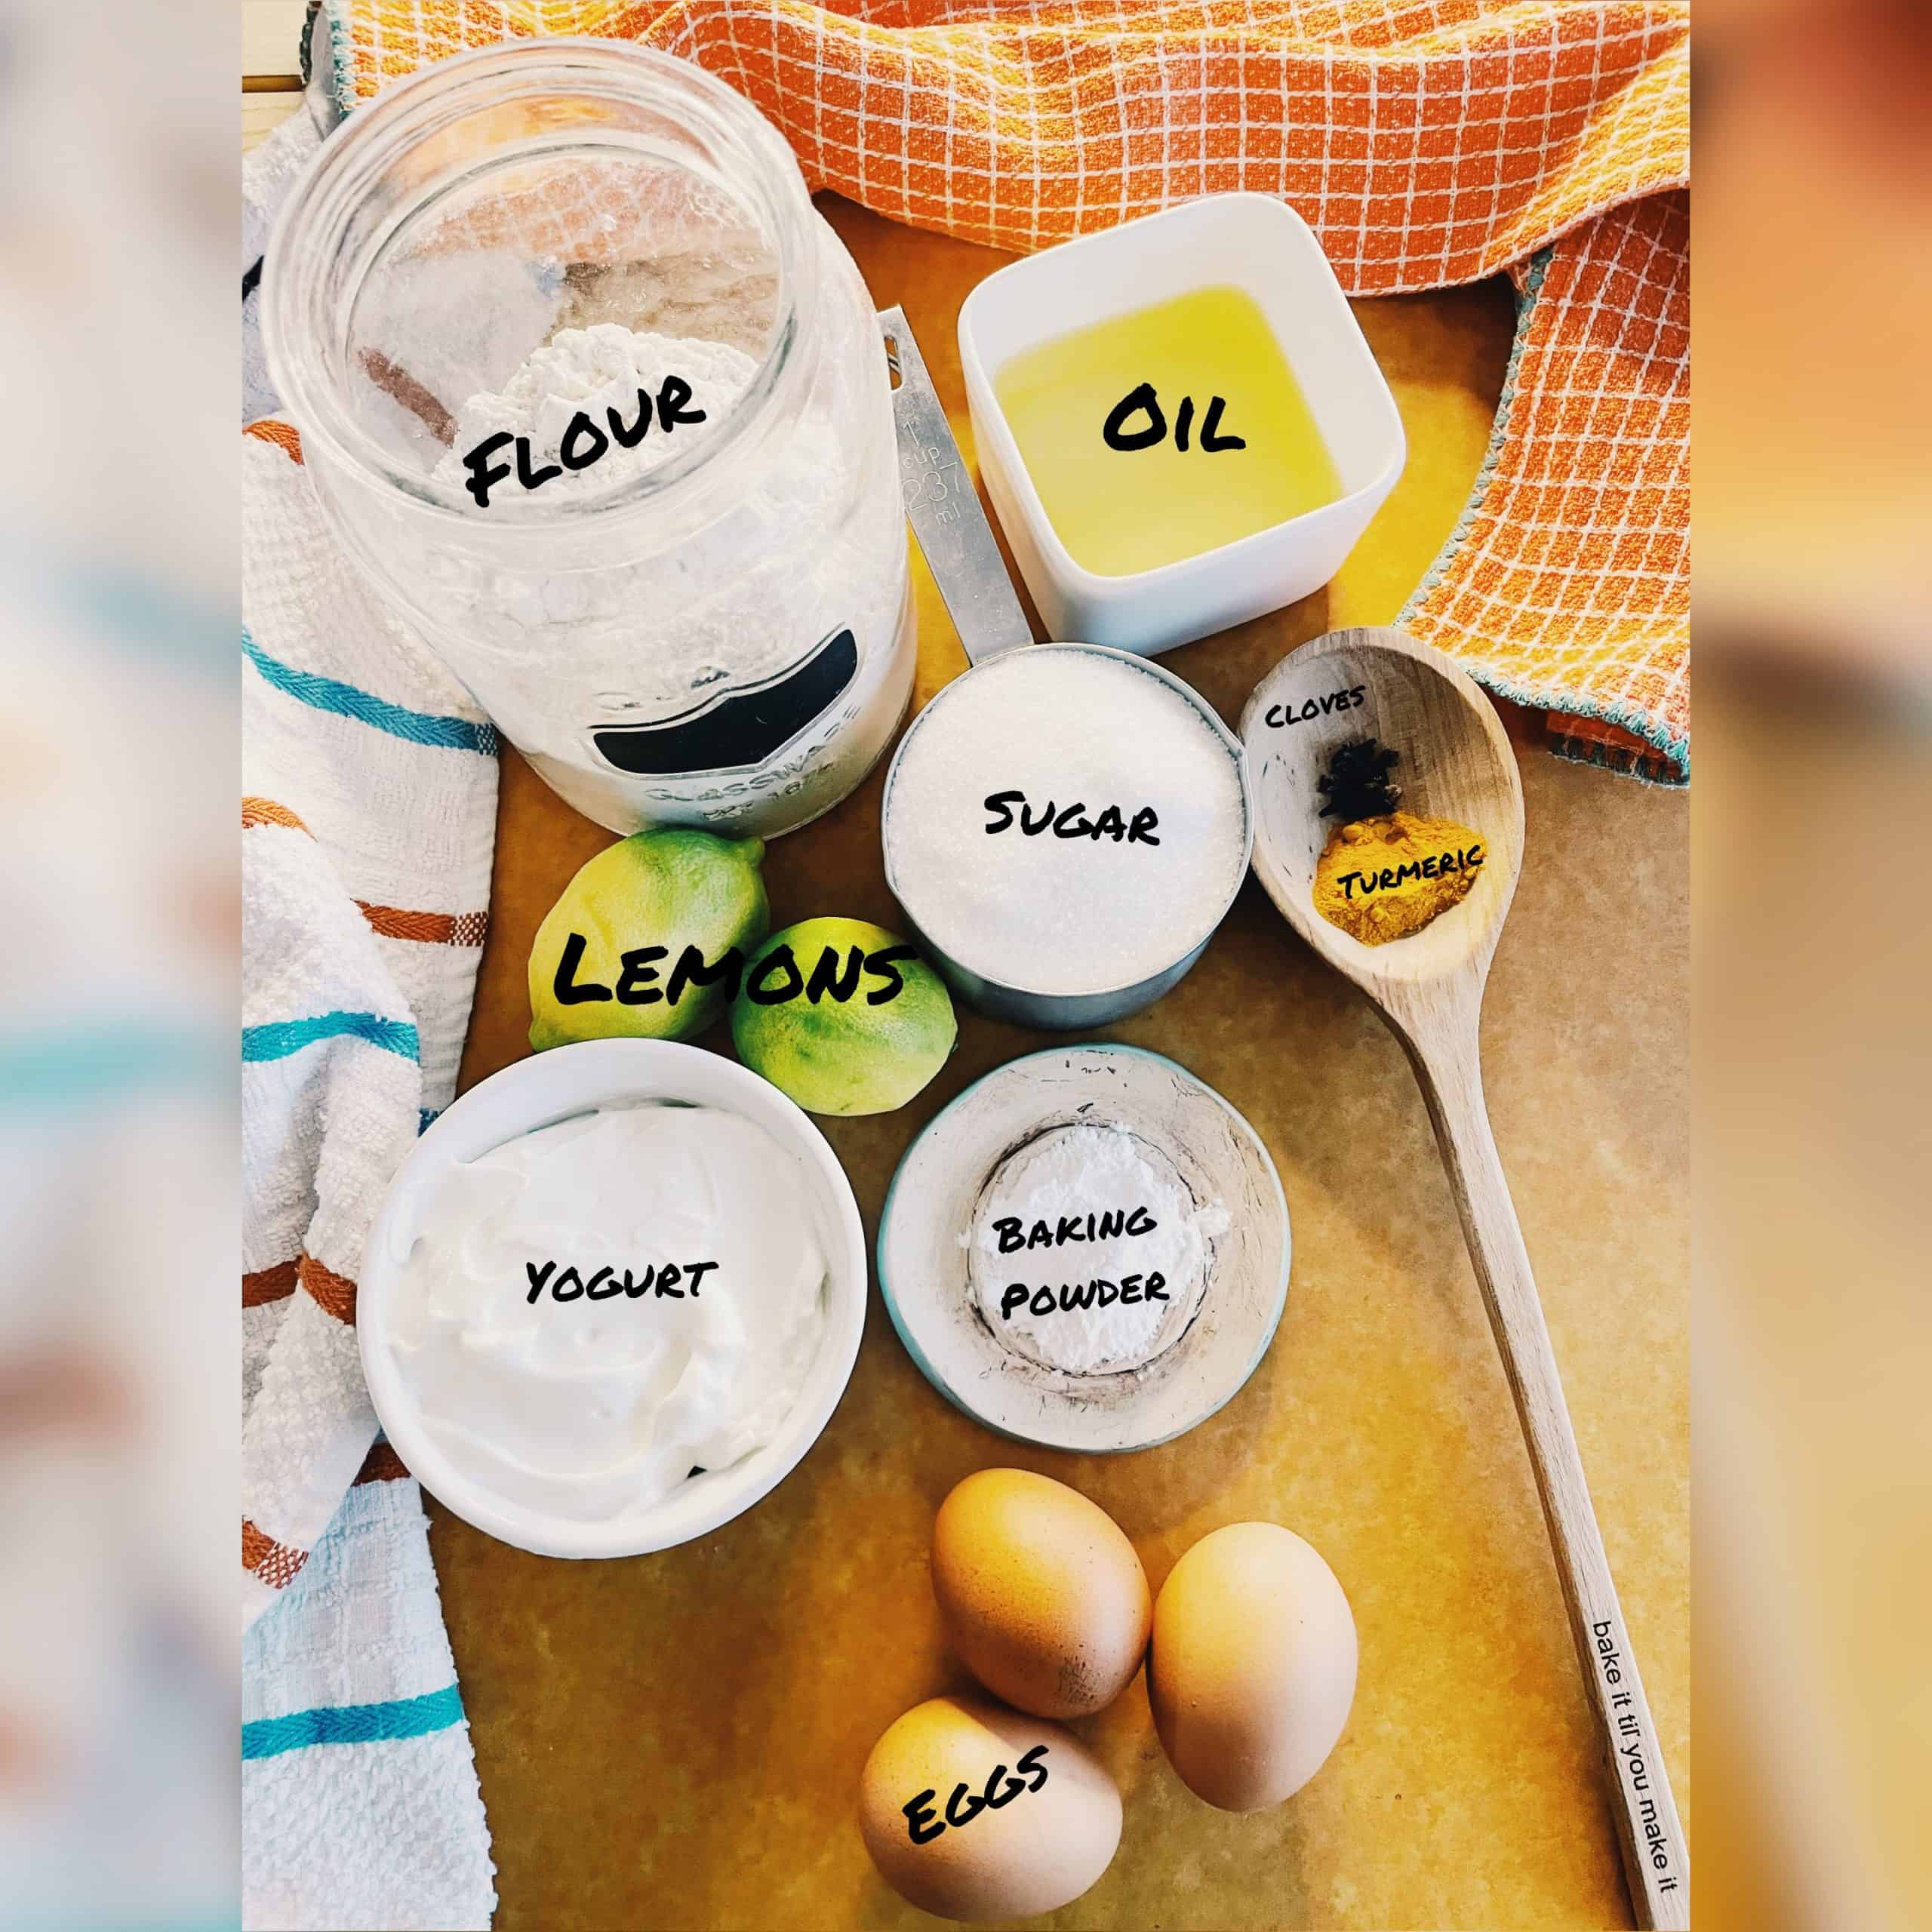 Ingredients List of flour, oil, cloves, turmeric, lemons, yogurt, sugar, eggs, baking powder